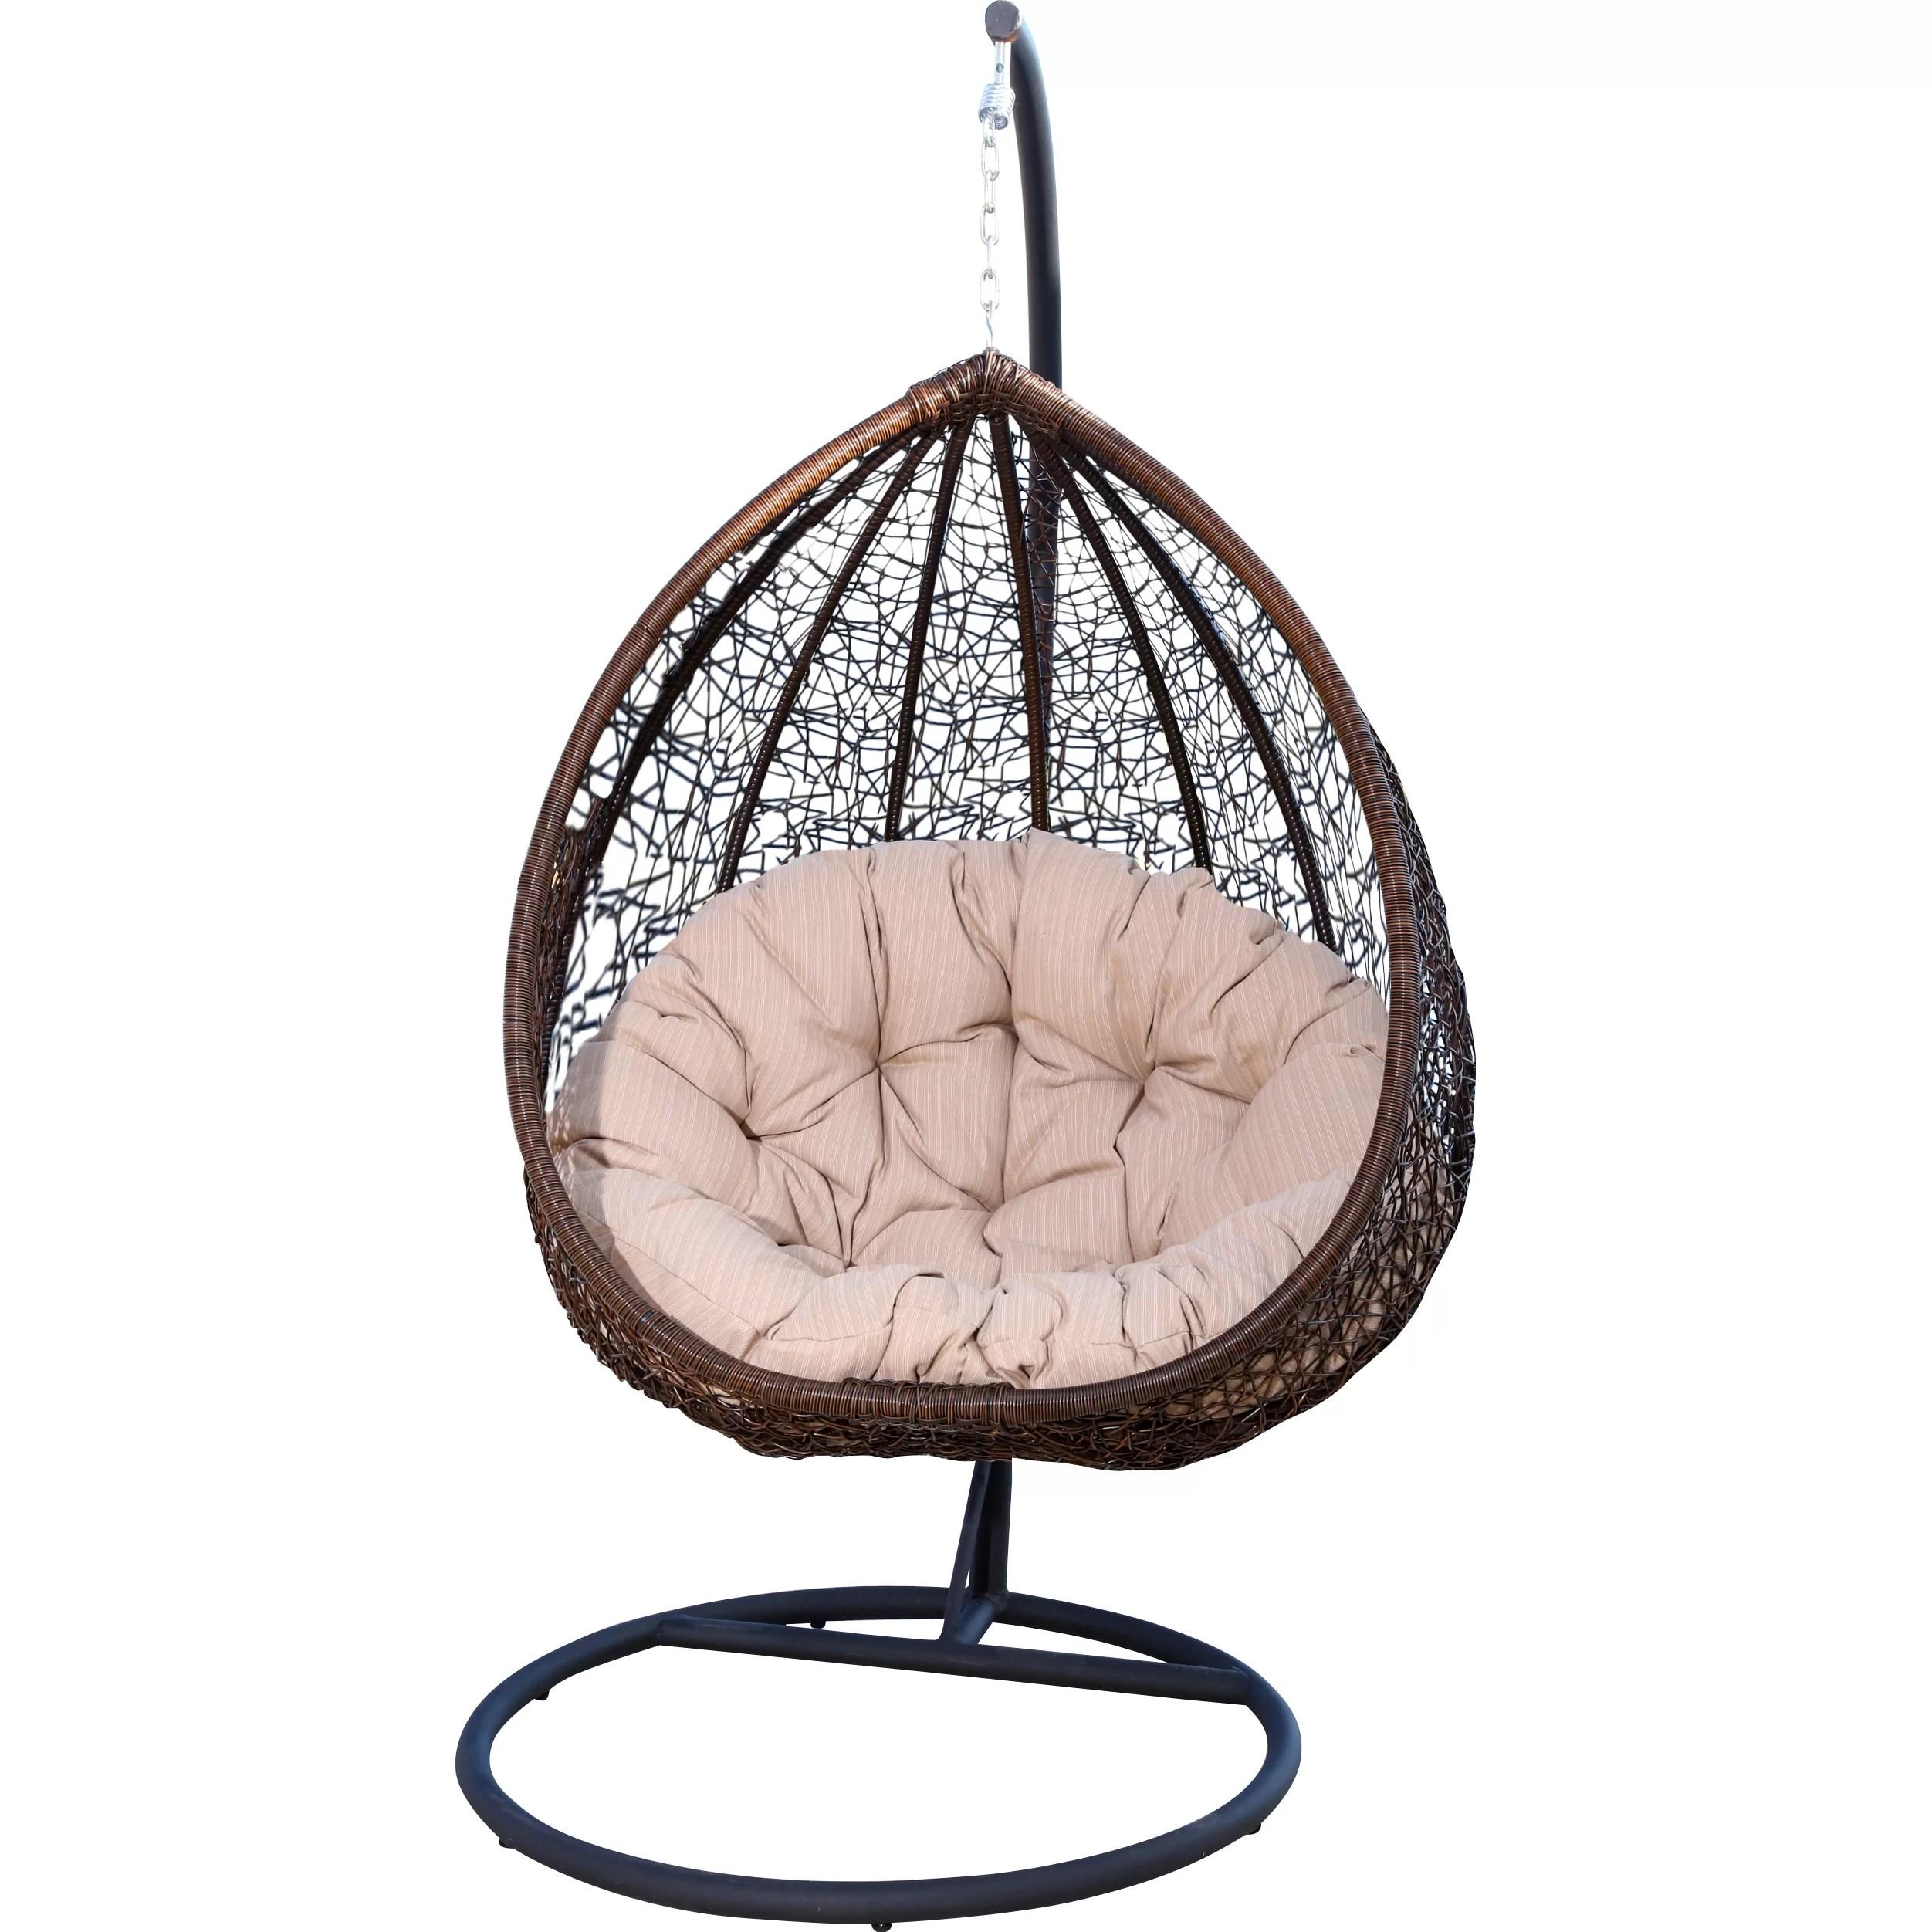 Abbyson Living Sonoma Swing Chair  Reviews  Wayfair